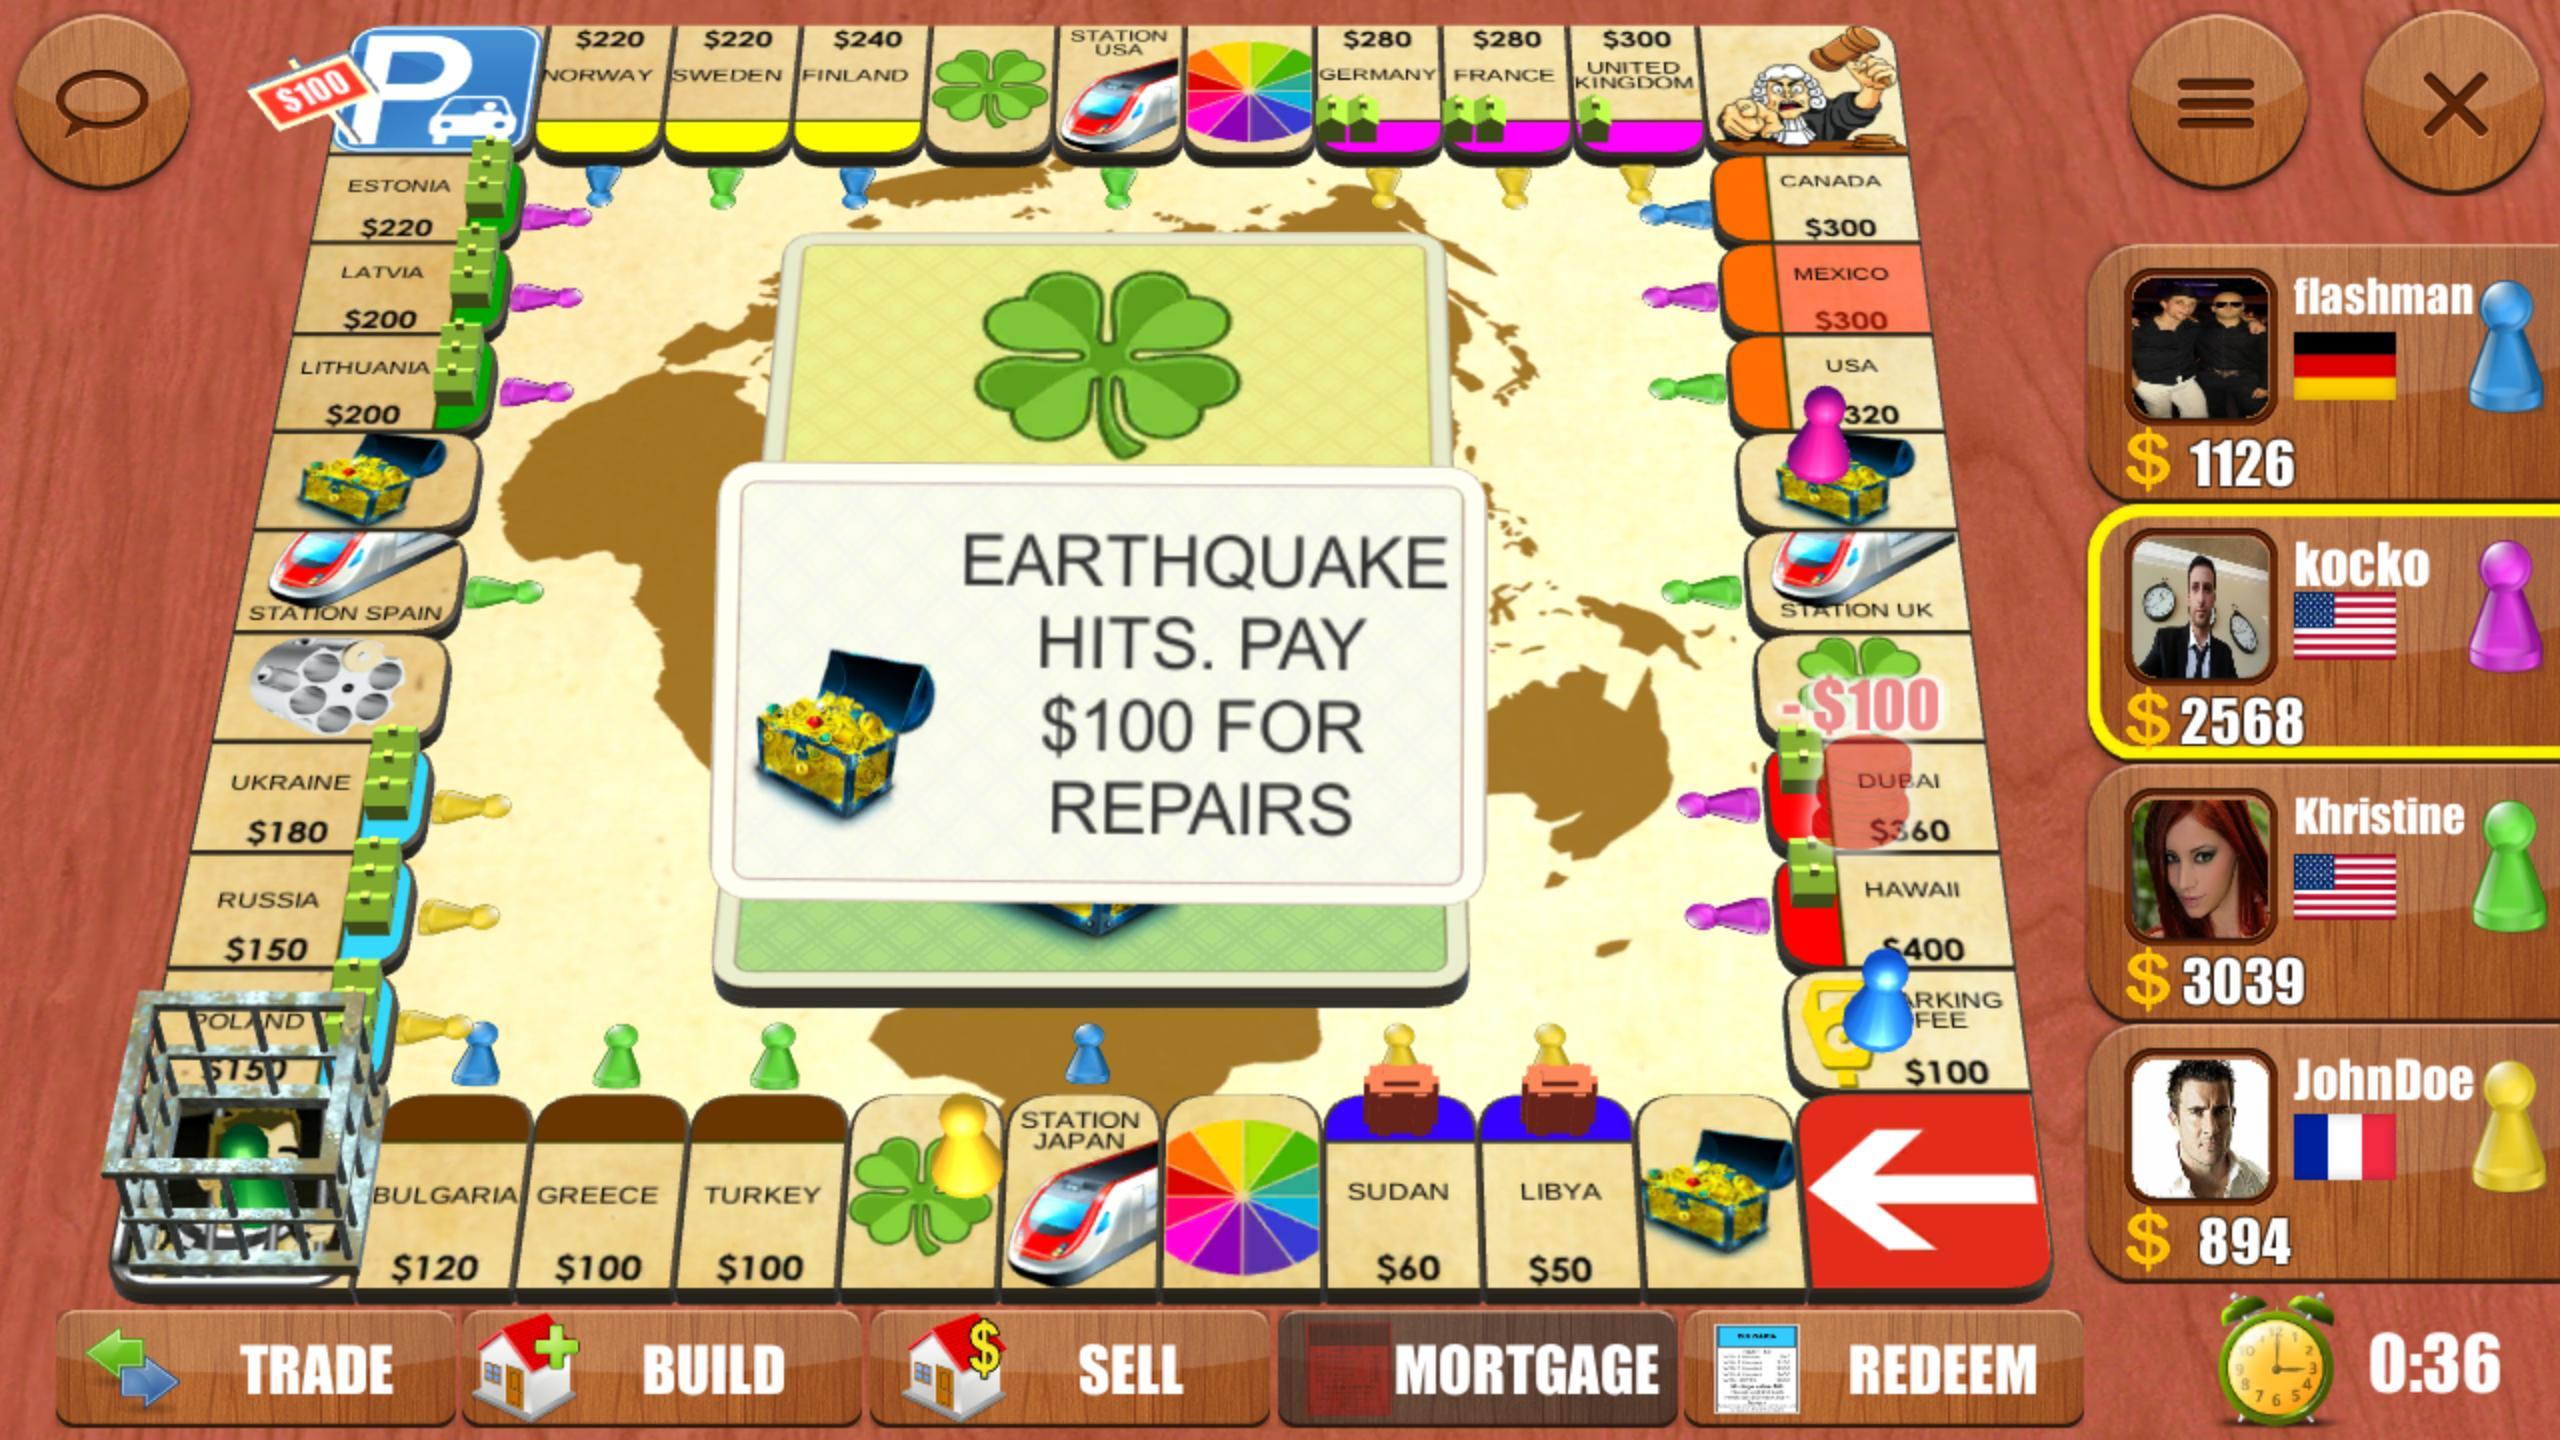 Rento Dice Board Game Online 5.1.9 Screenshot 5